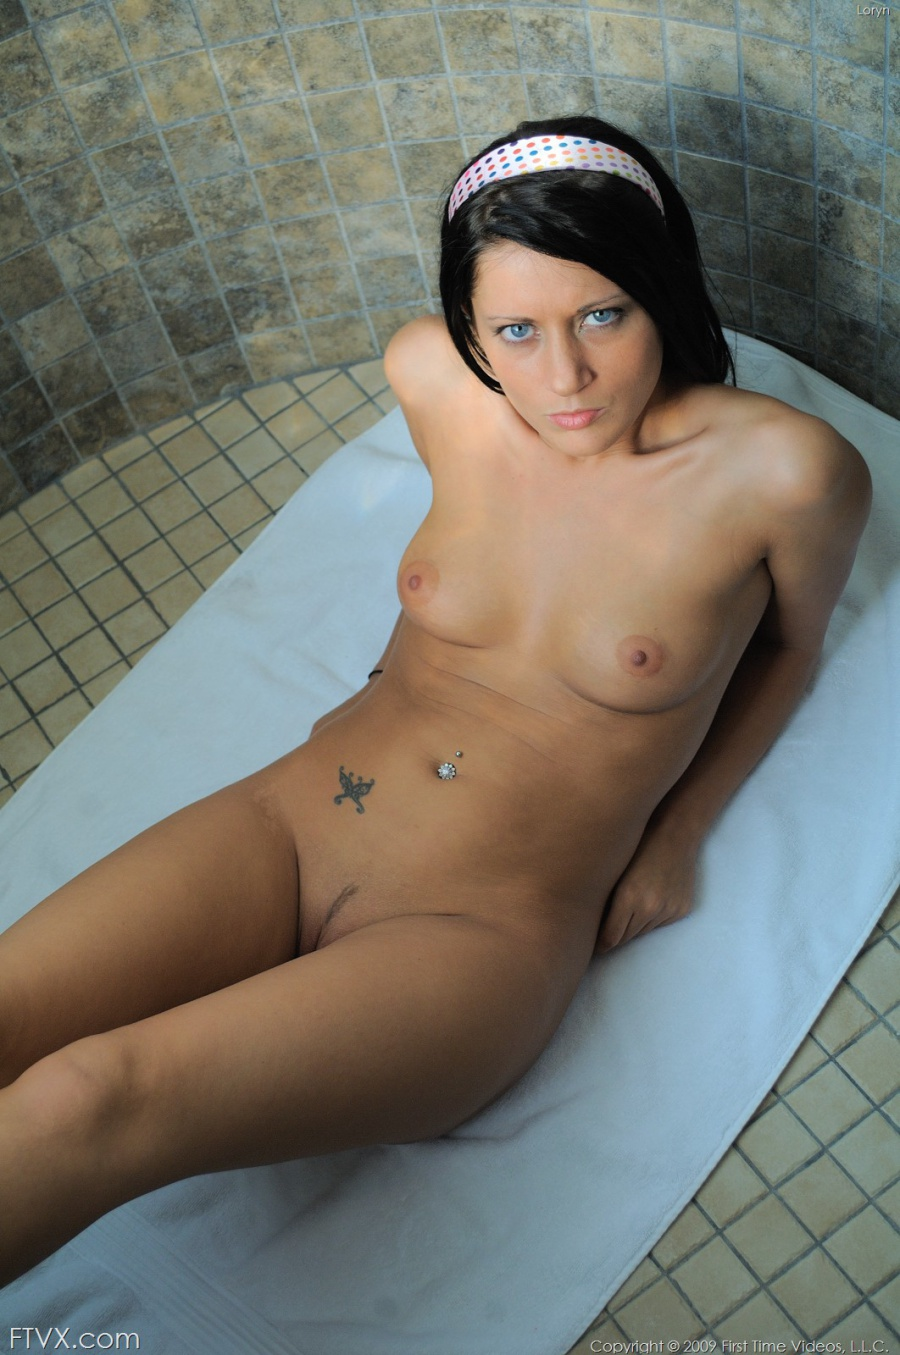 imagepost 2010 4 ftvx loryn fucks her boyfriend ftvx loryn fucks her boyfriend 014